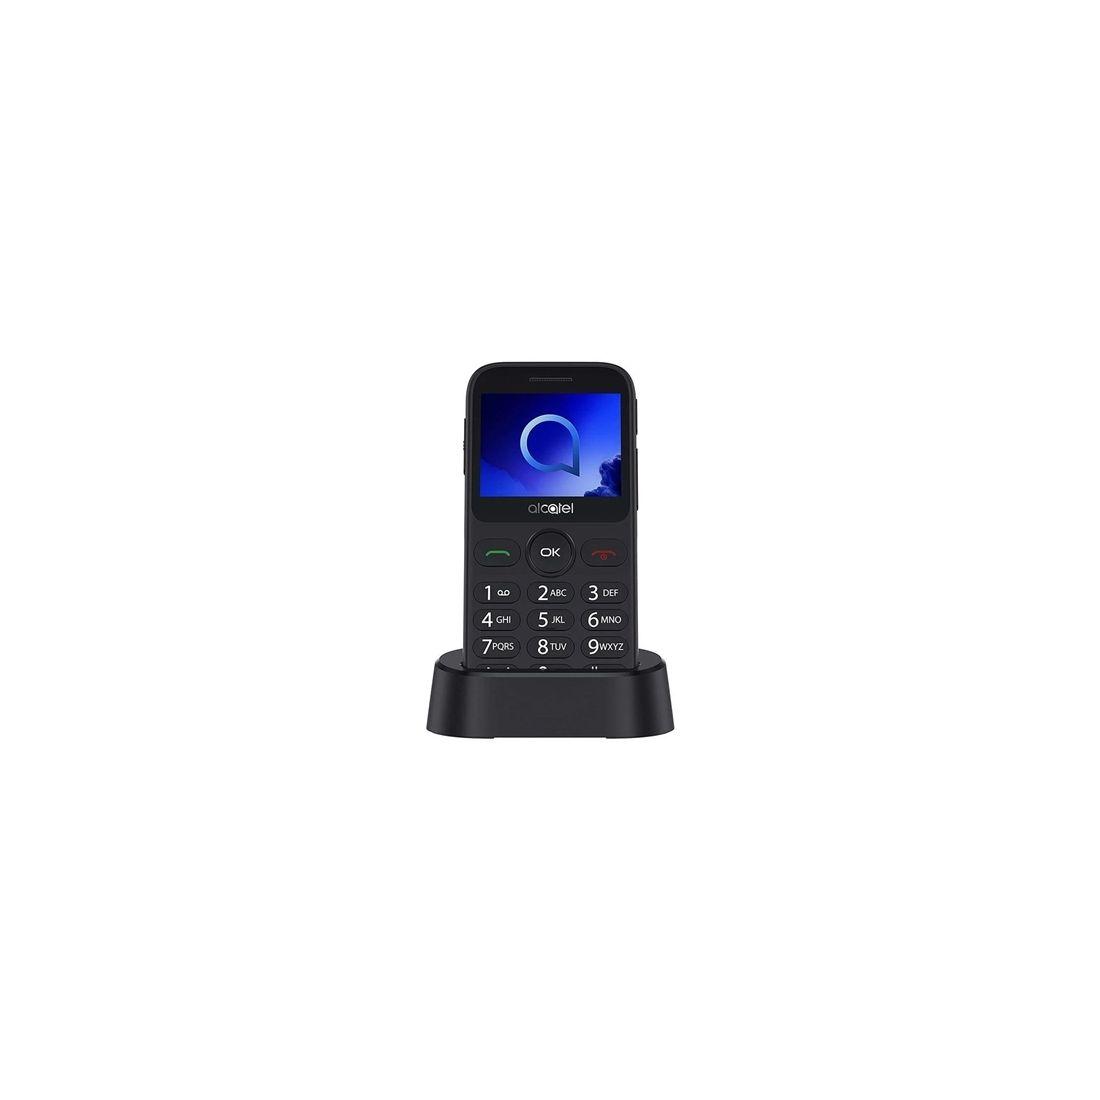 Alcatel 2019G Telefono Movil 24 QVGA Gris